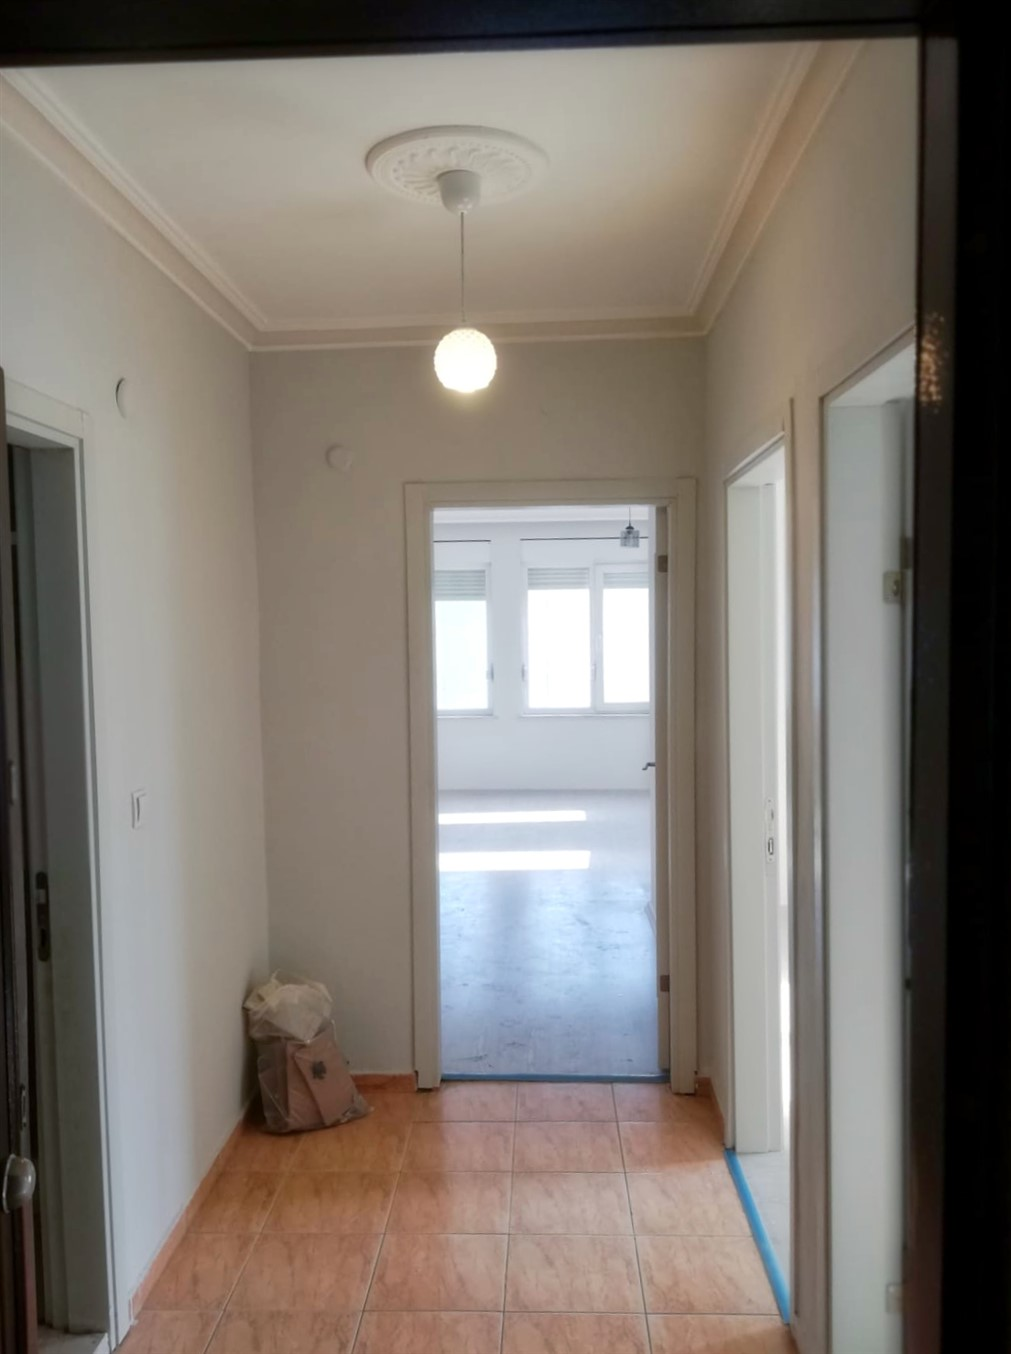 Трёхкомнатная квартира в районе Коньяалты - Фото 2